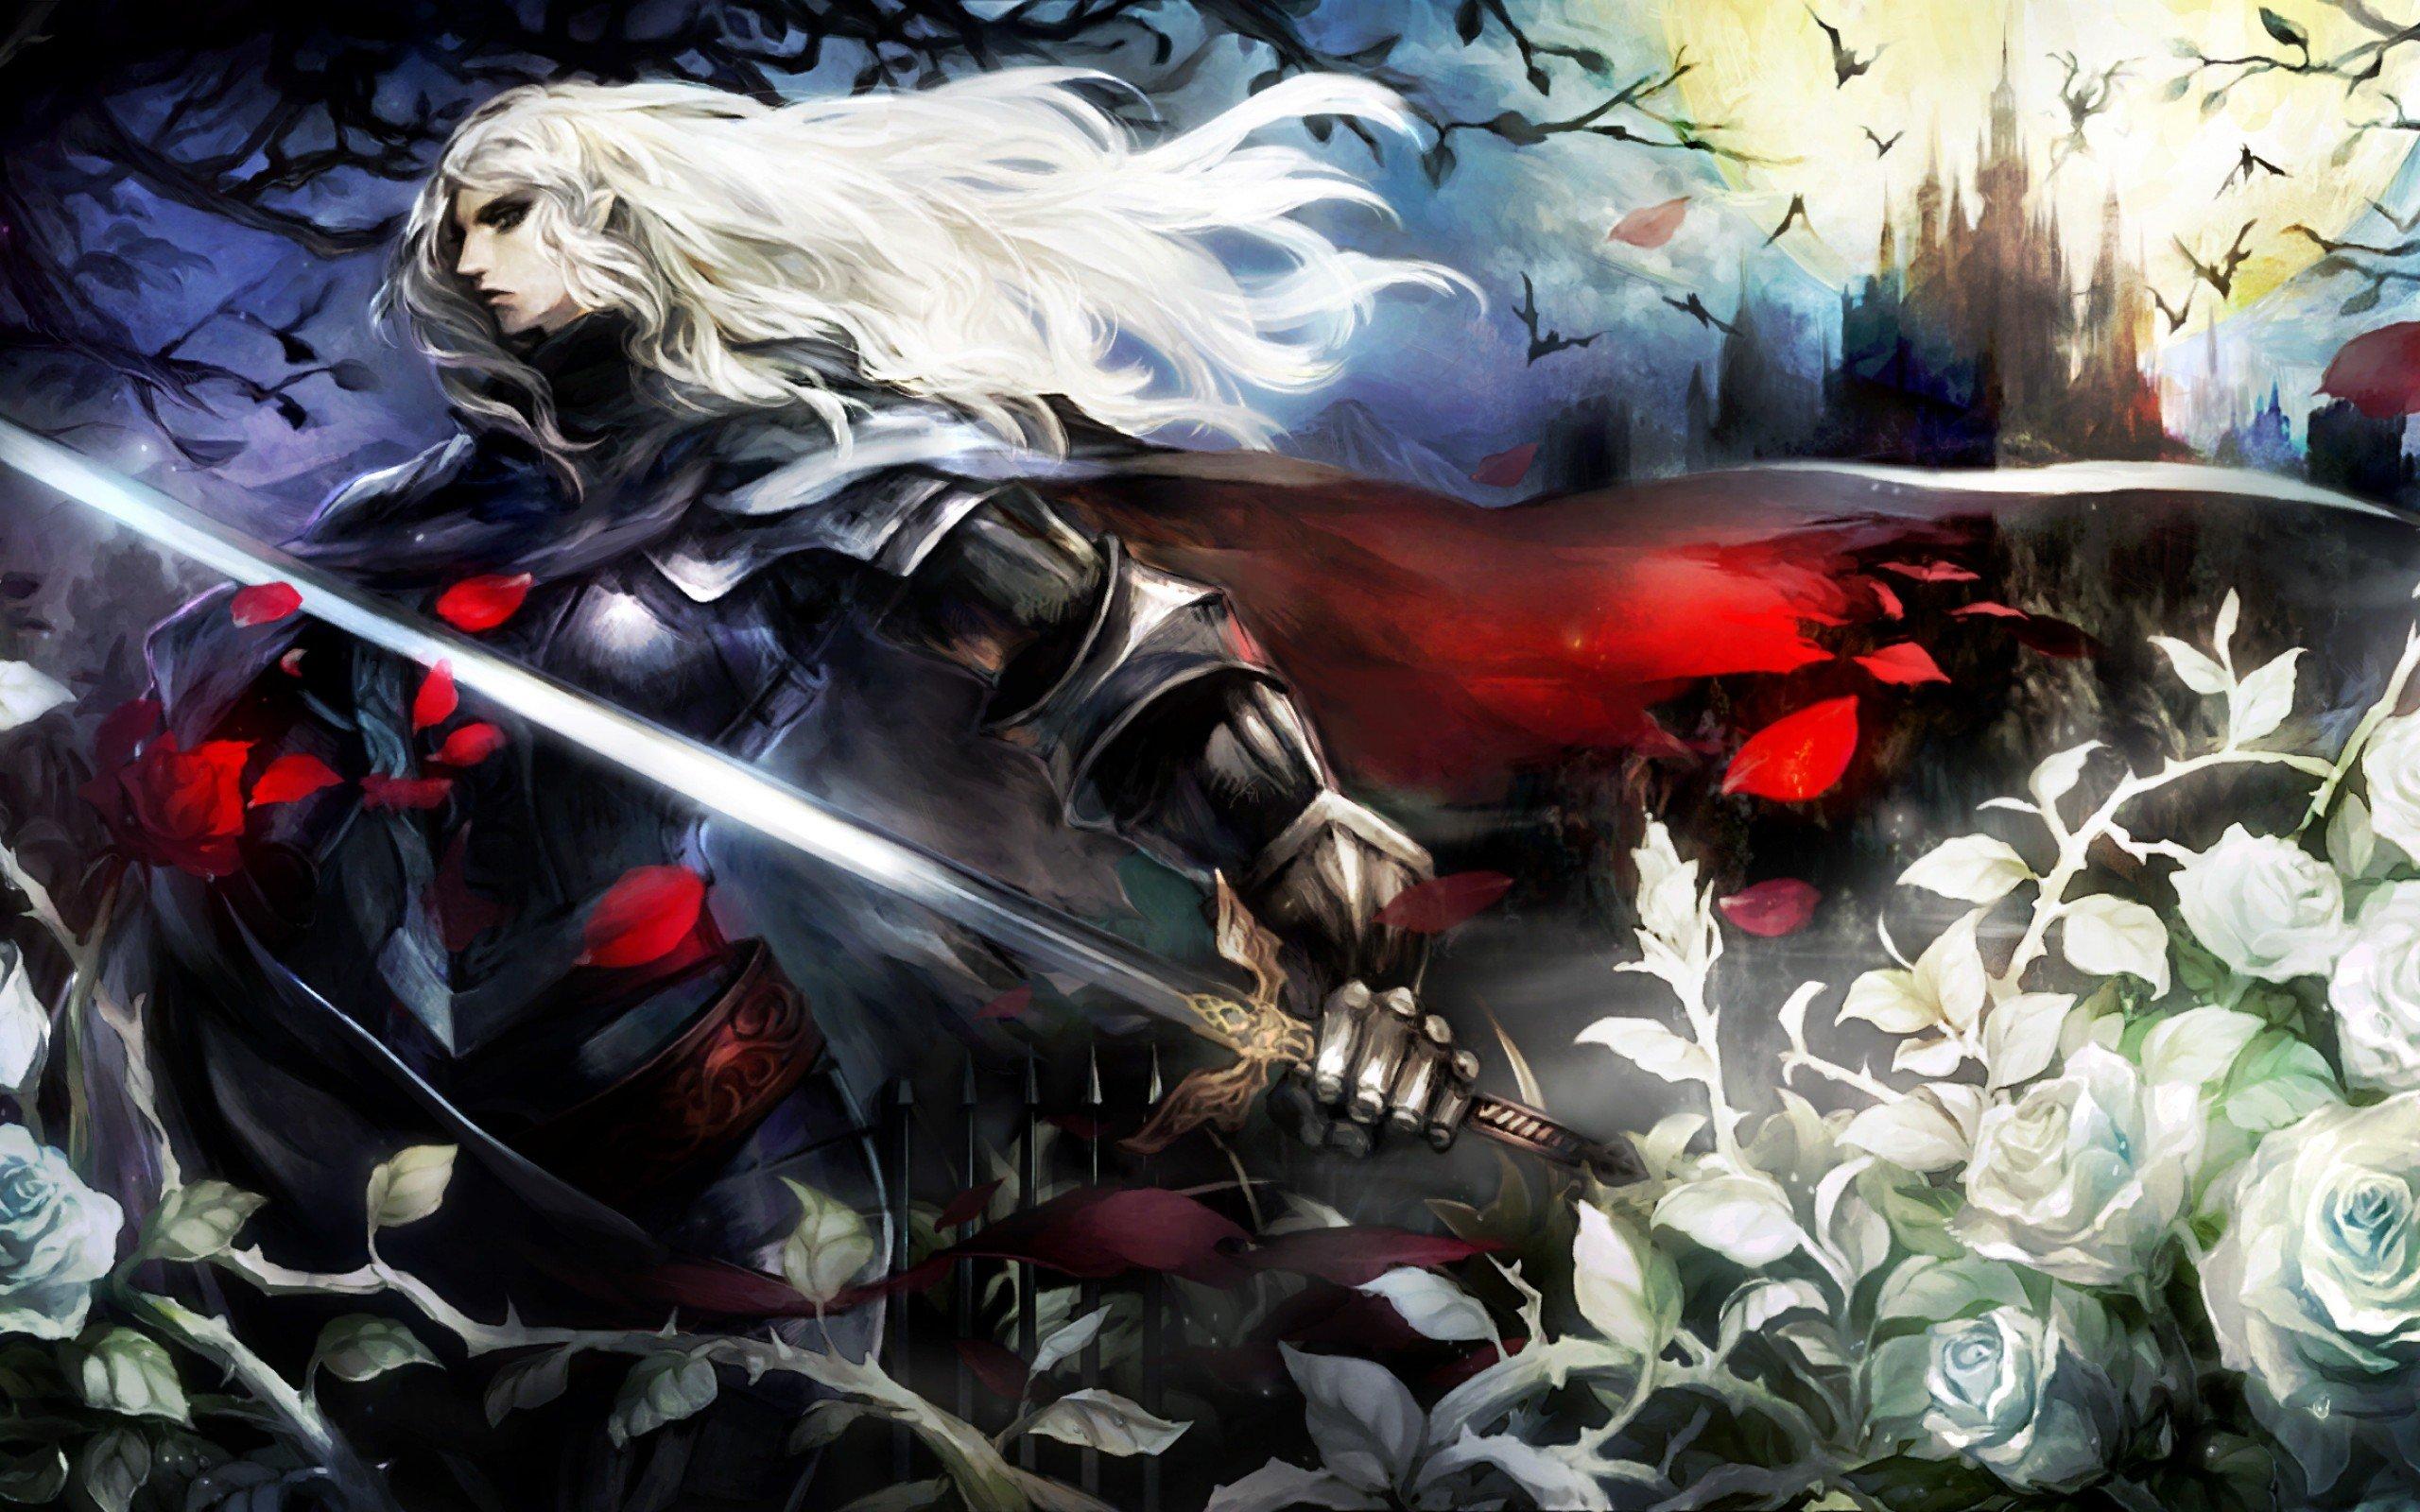 castle, Castlevania, Rose, RPG, Video games, Dragons Crown Wallpaper